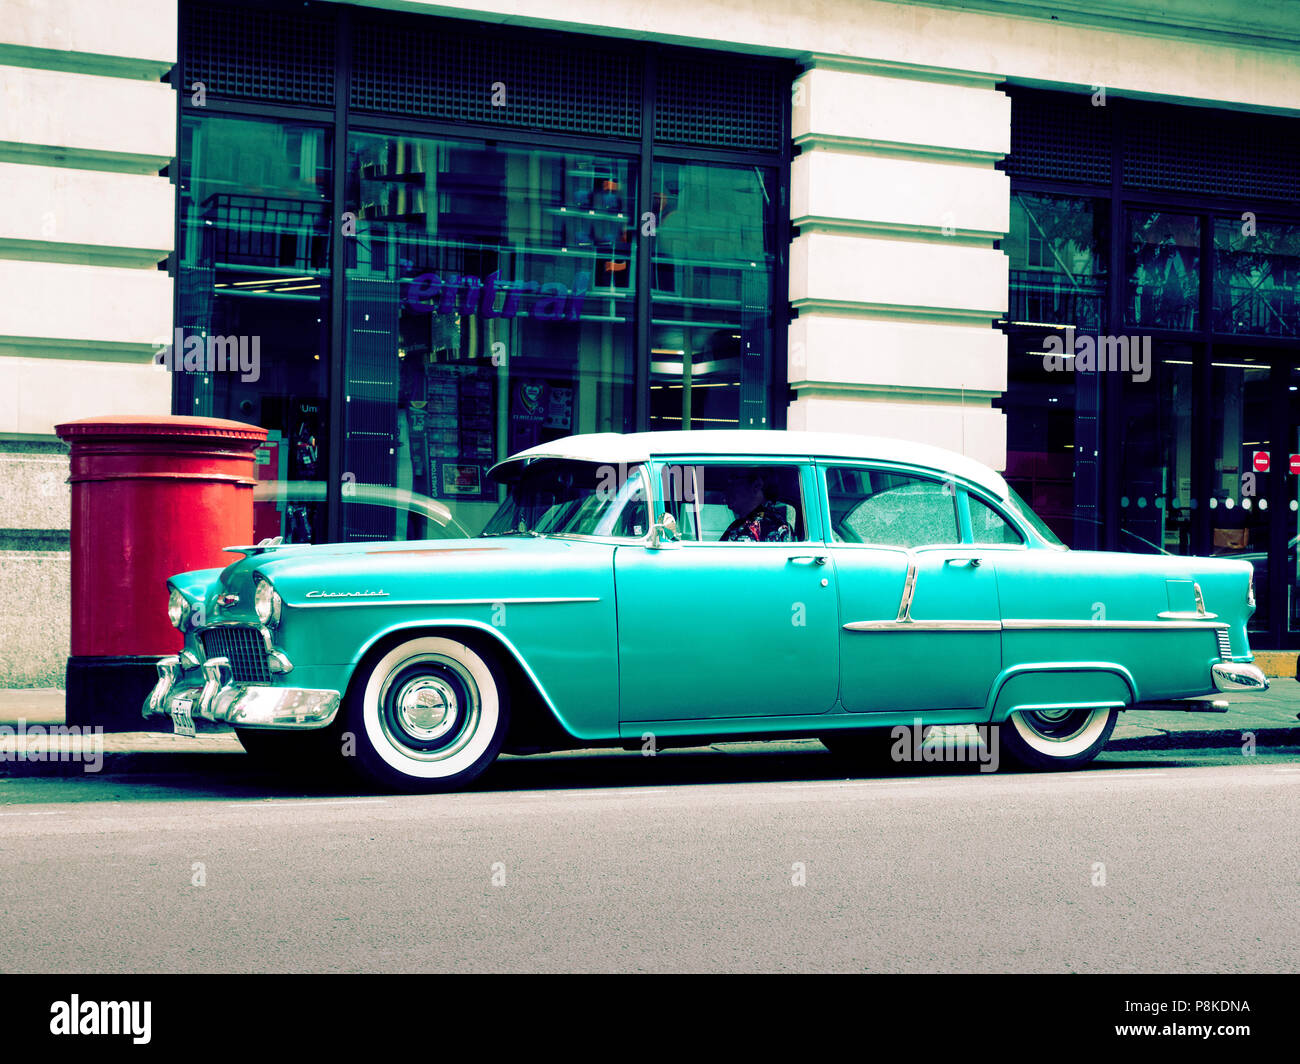 1955 Chevrolet 210 parked on a street ti London UK London UK - Stock Image